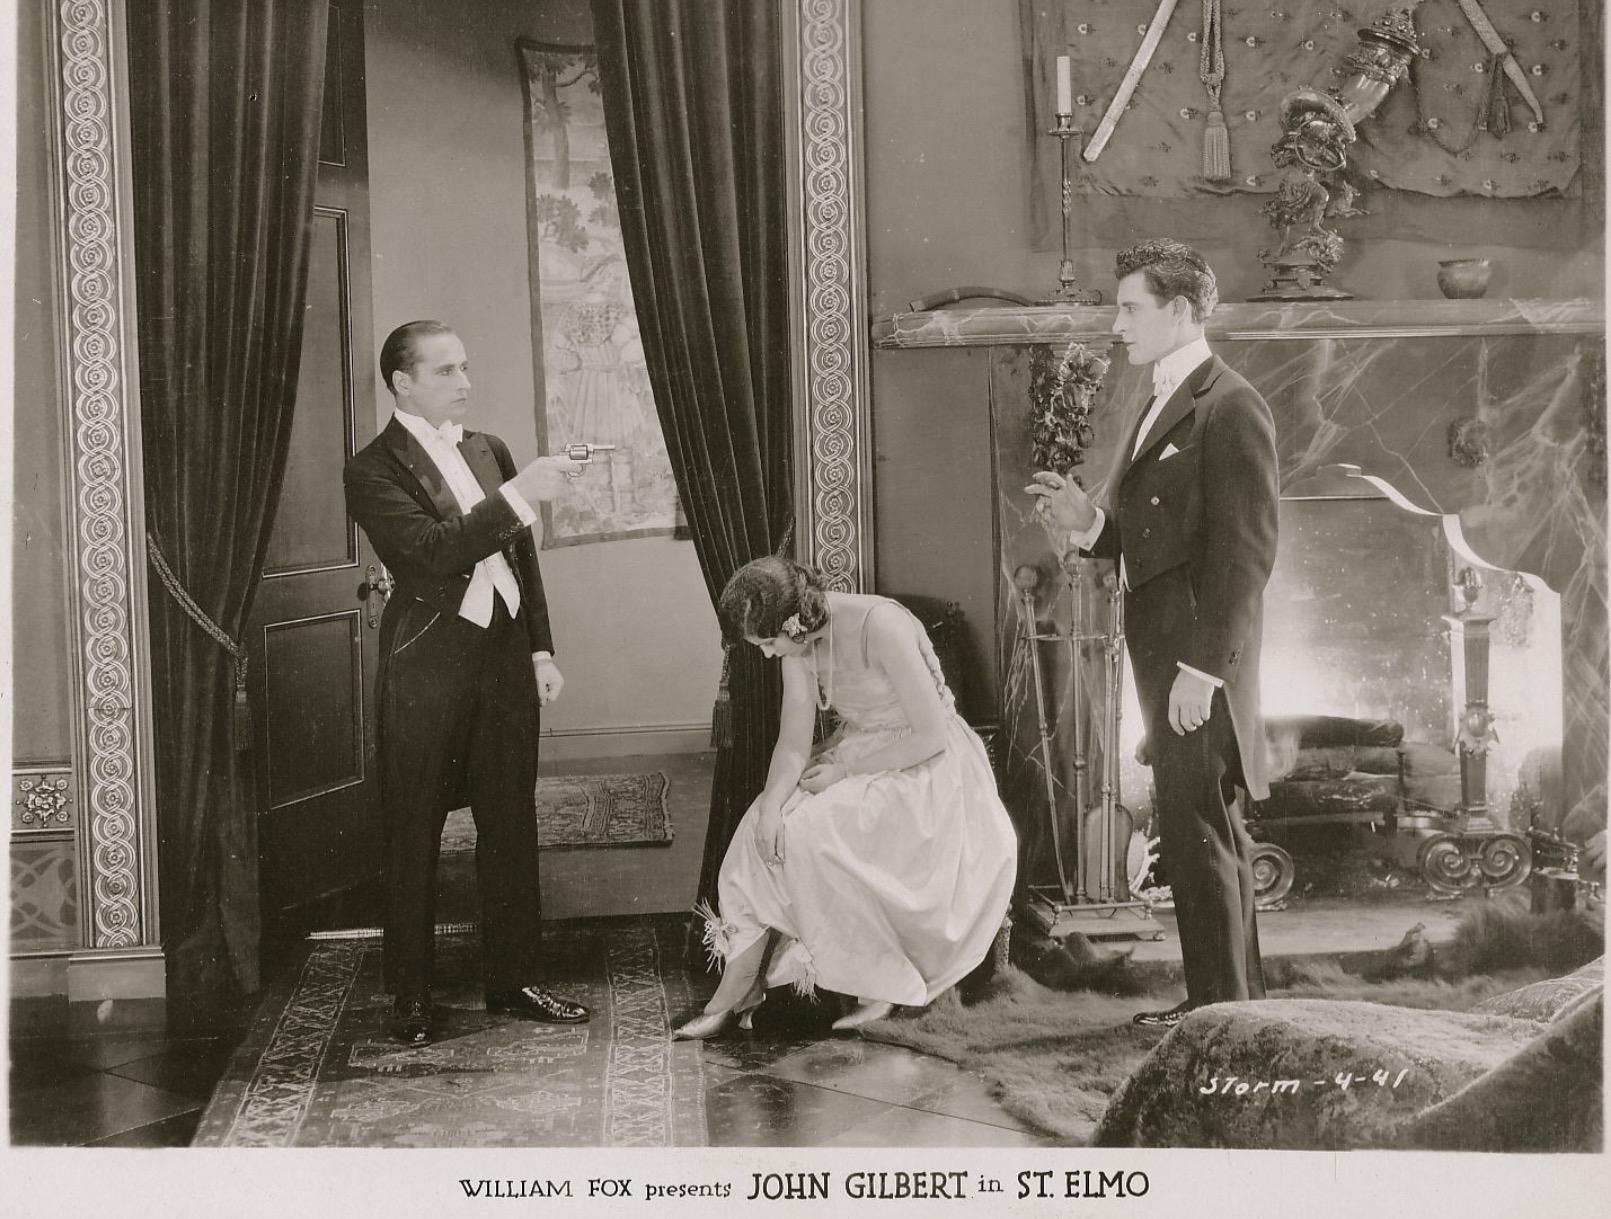 Warner Baxter, John Gilbert, and Barbara La Marr in St. Elmo (1923)